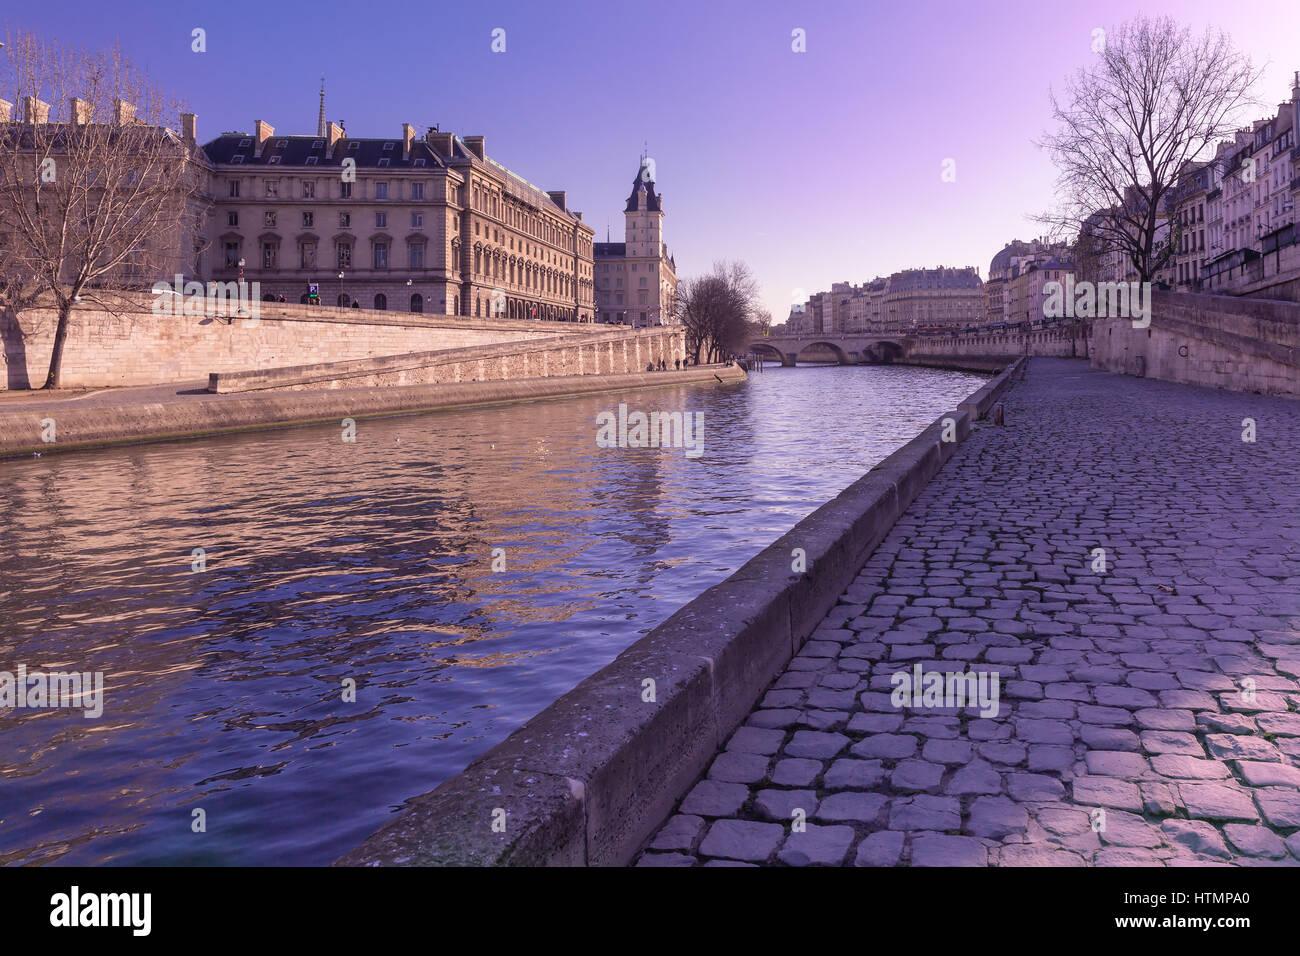 Embankment of the Seine near the Ile de la Cite in the winter morning, Paris, France - Stock Image